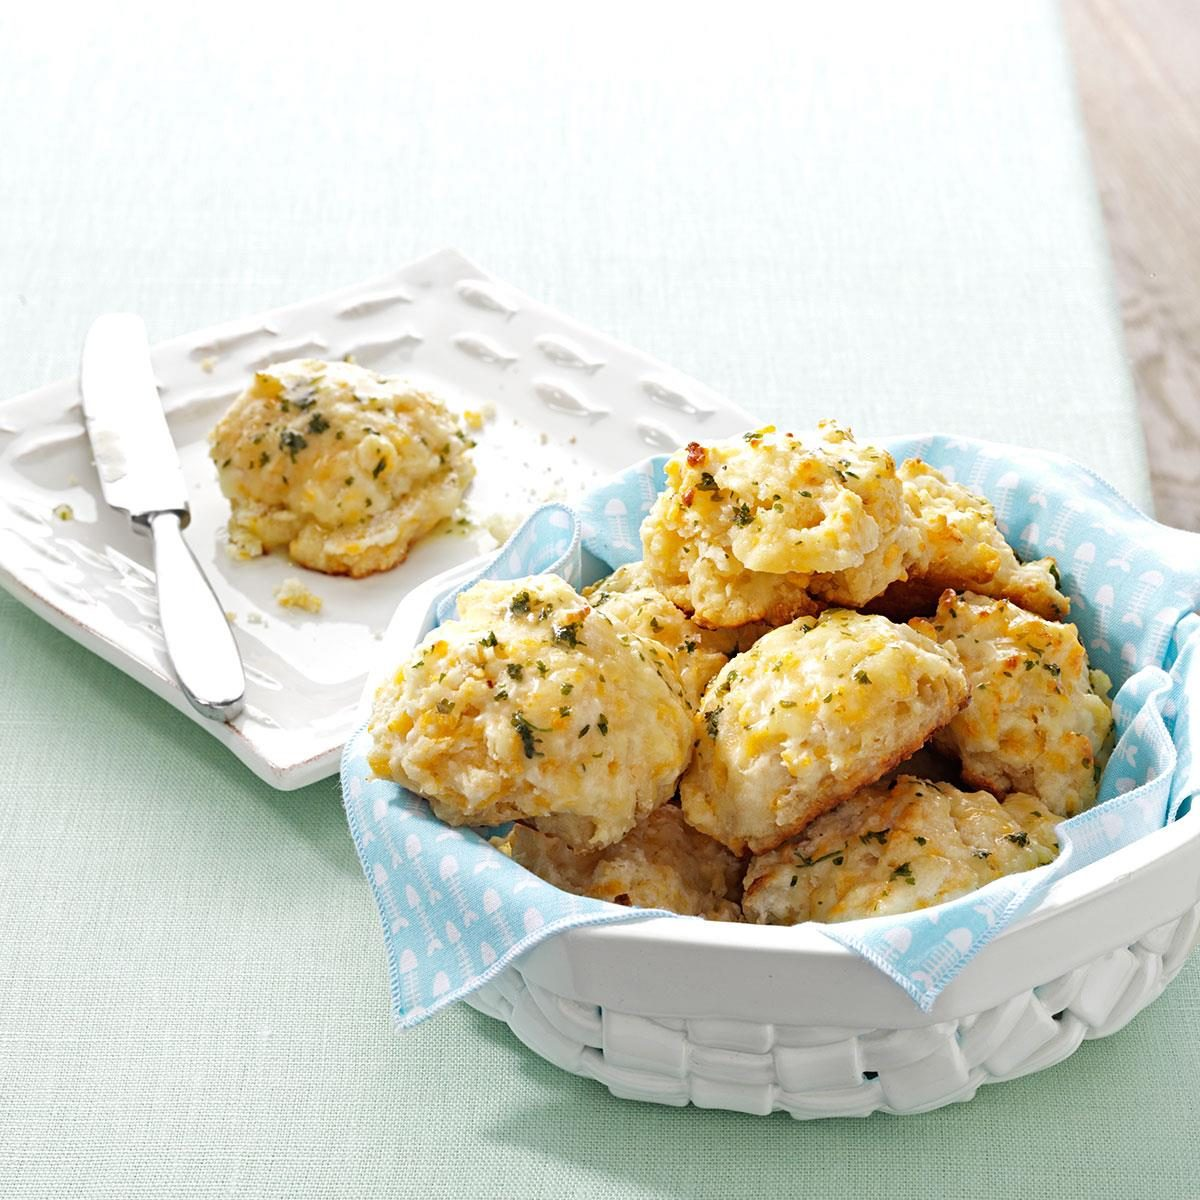 Makeover Cheddar Biscuits Recipe | Taste of Home